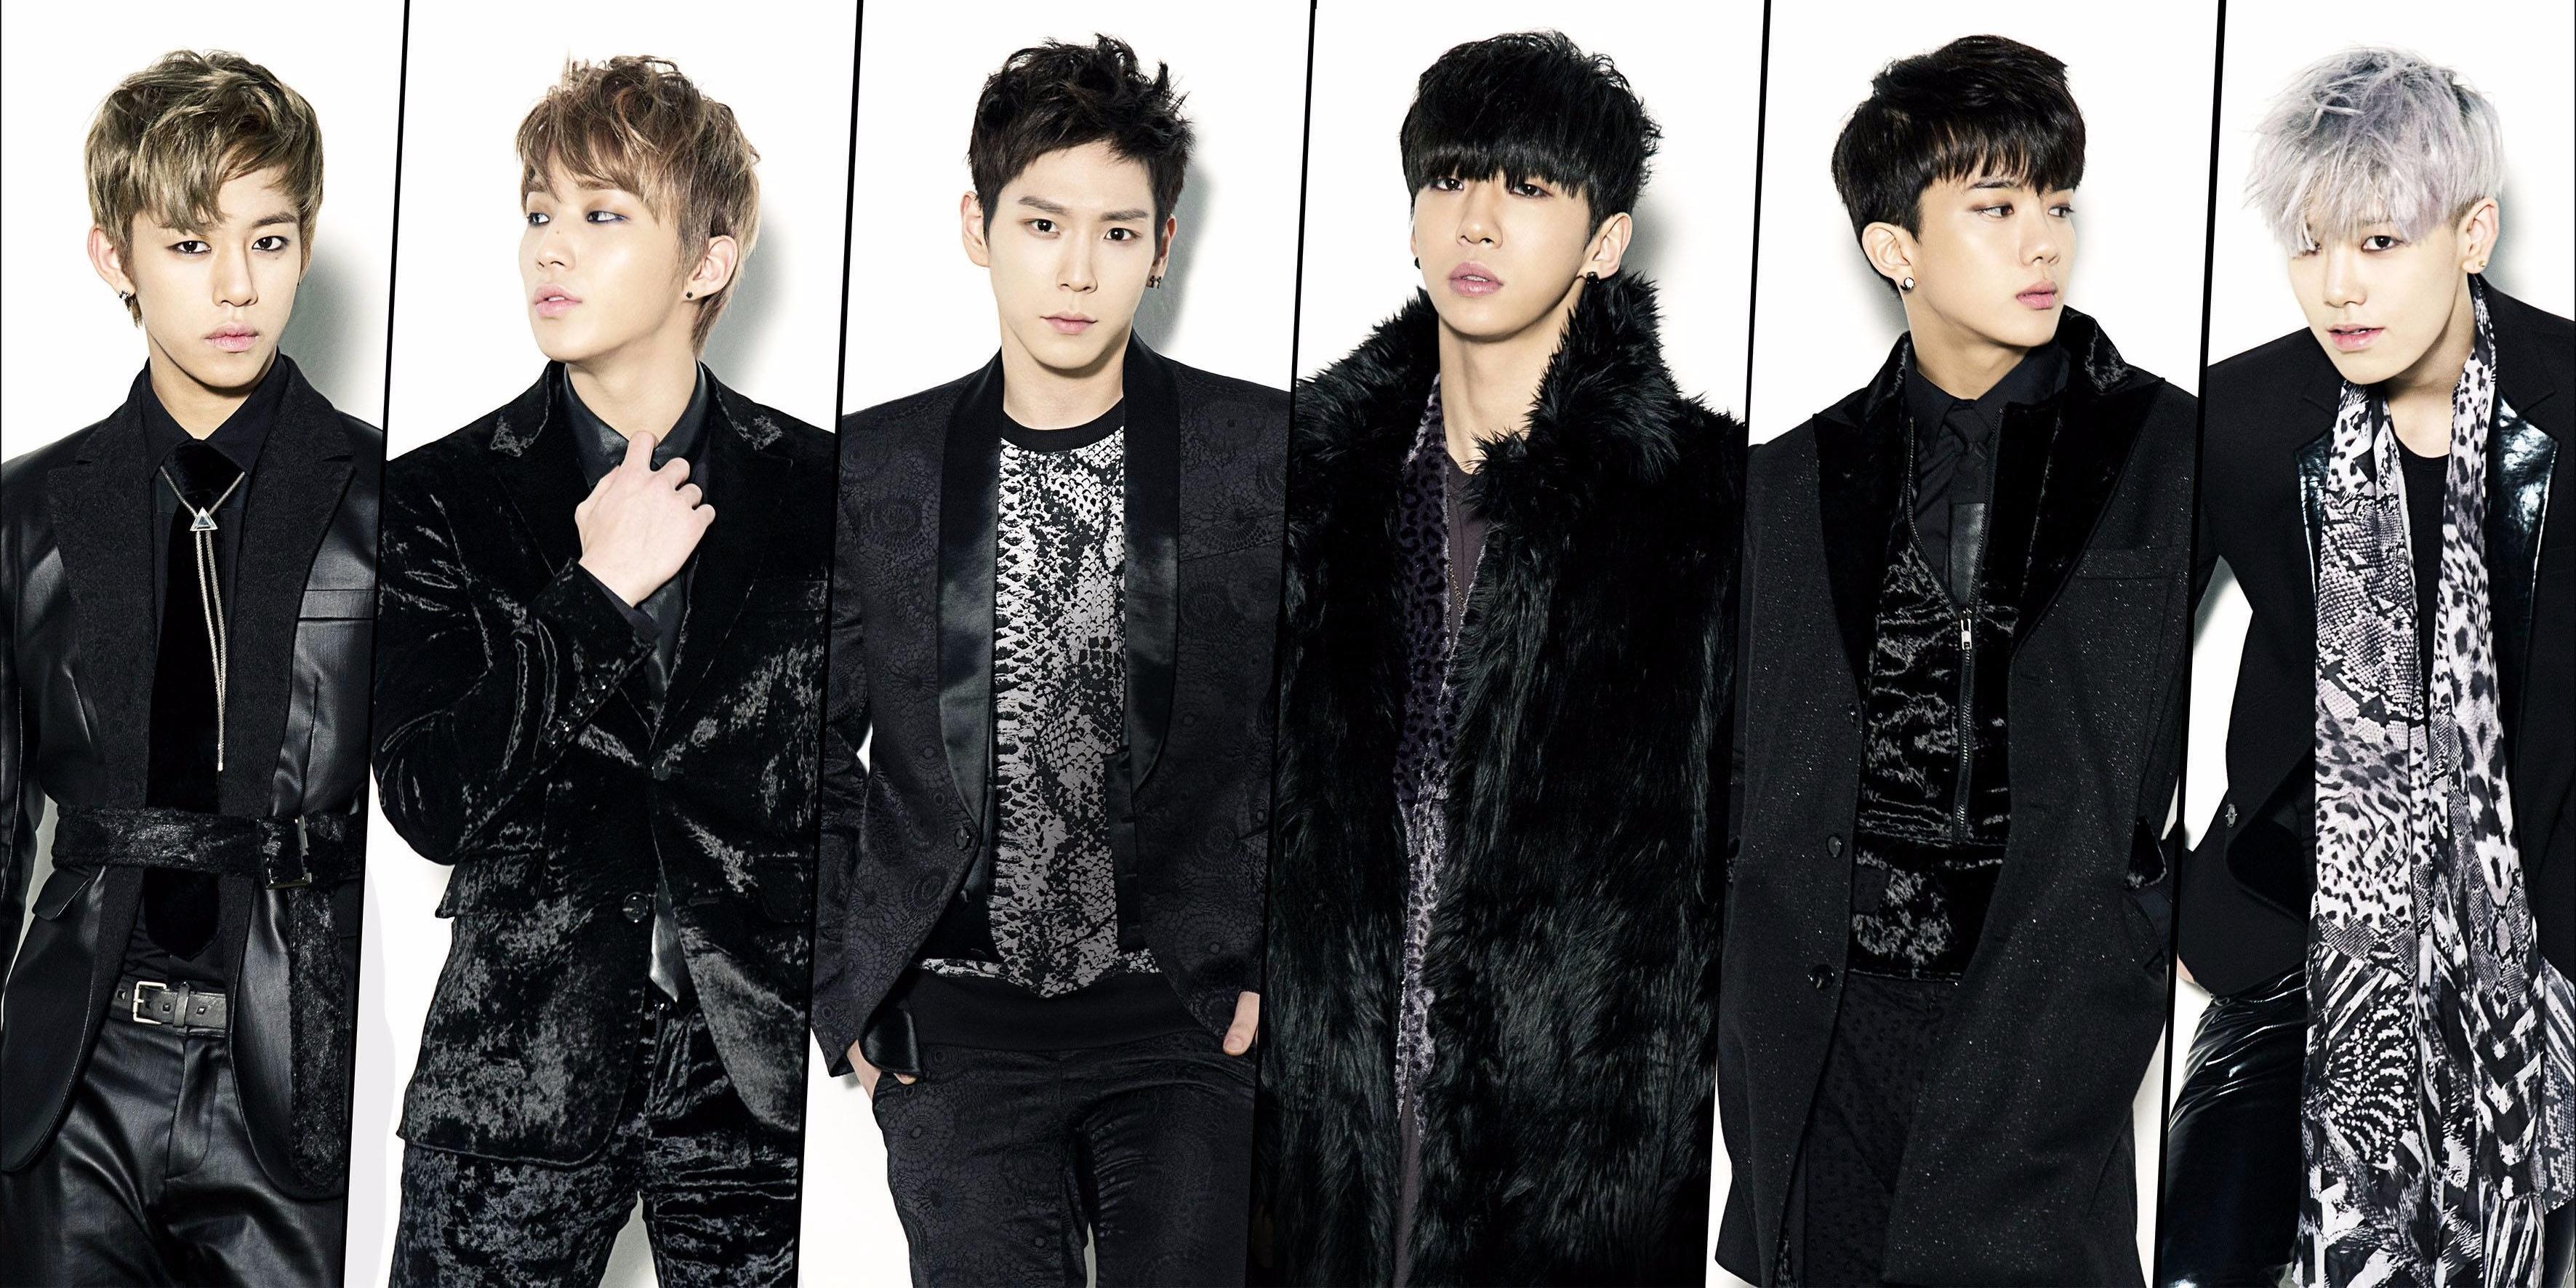 South Korean boyband B.A.P returns to Singapore for their world tour